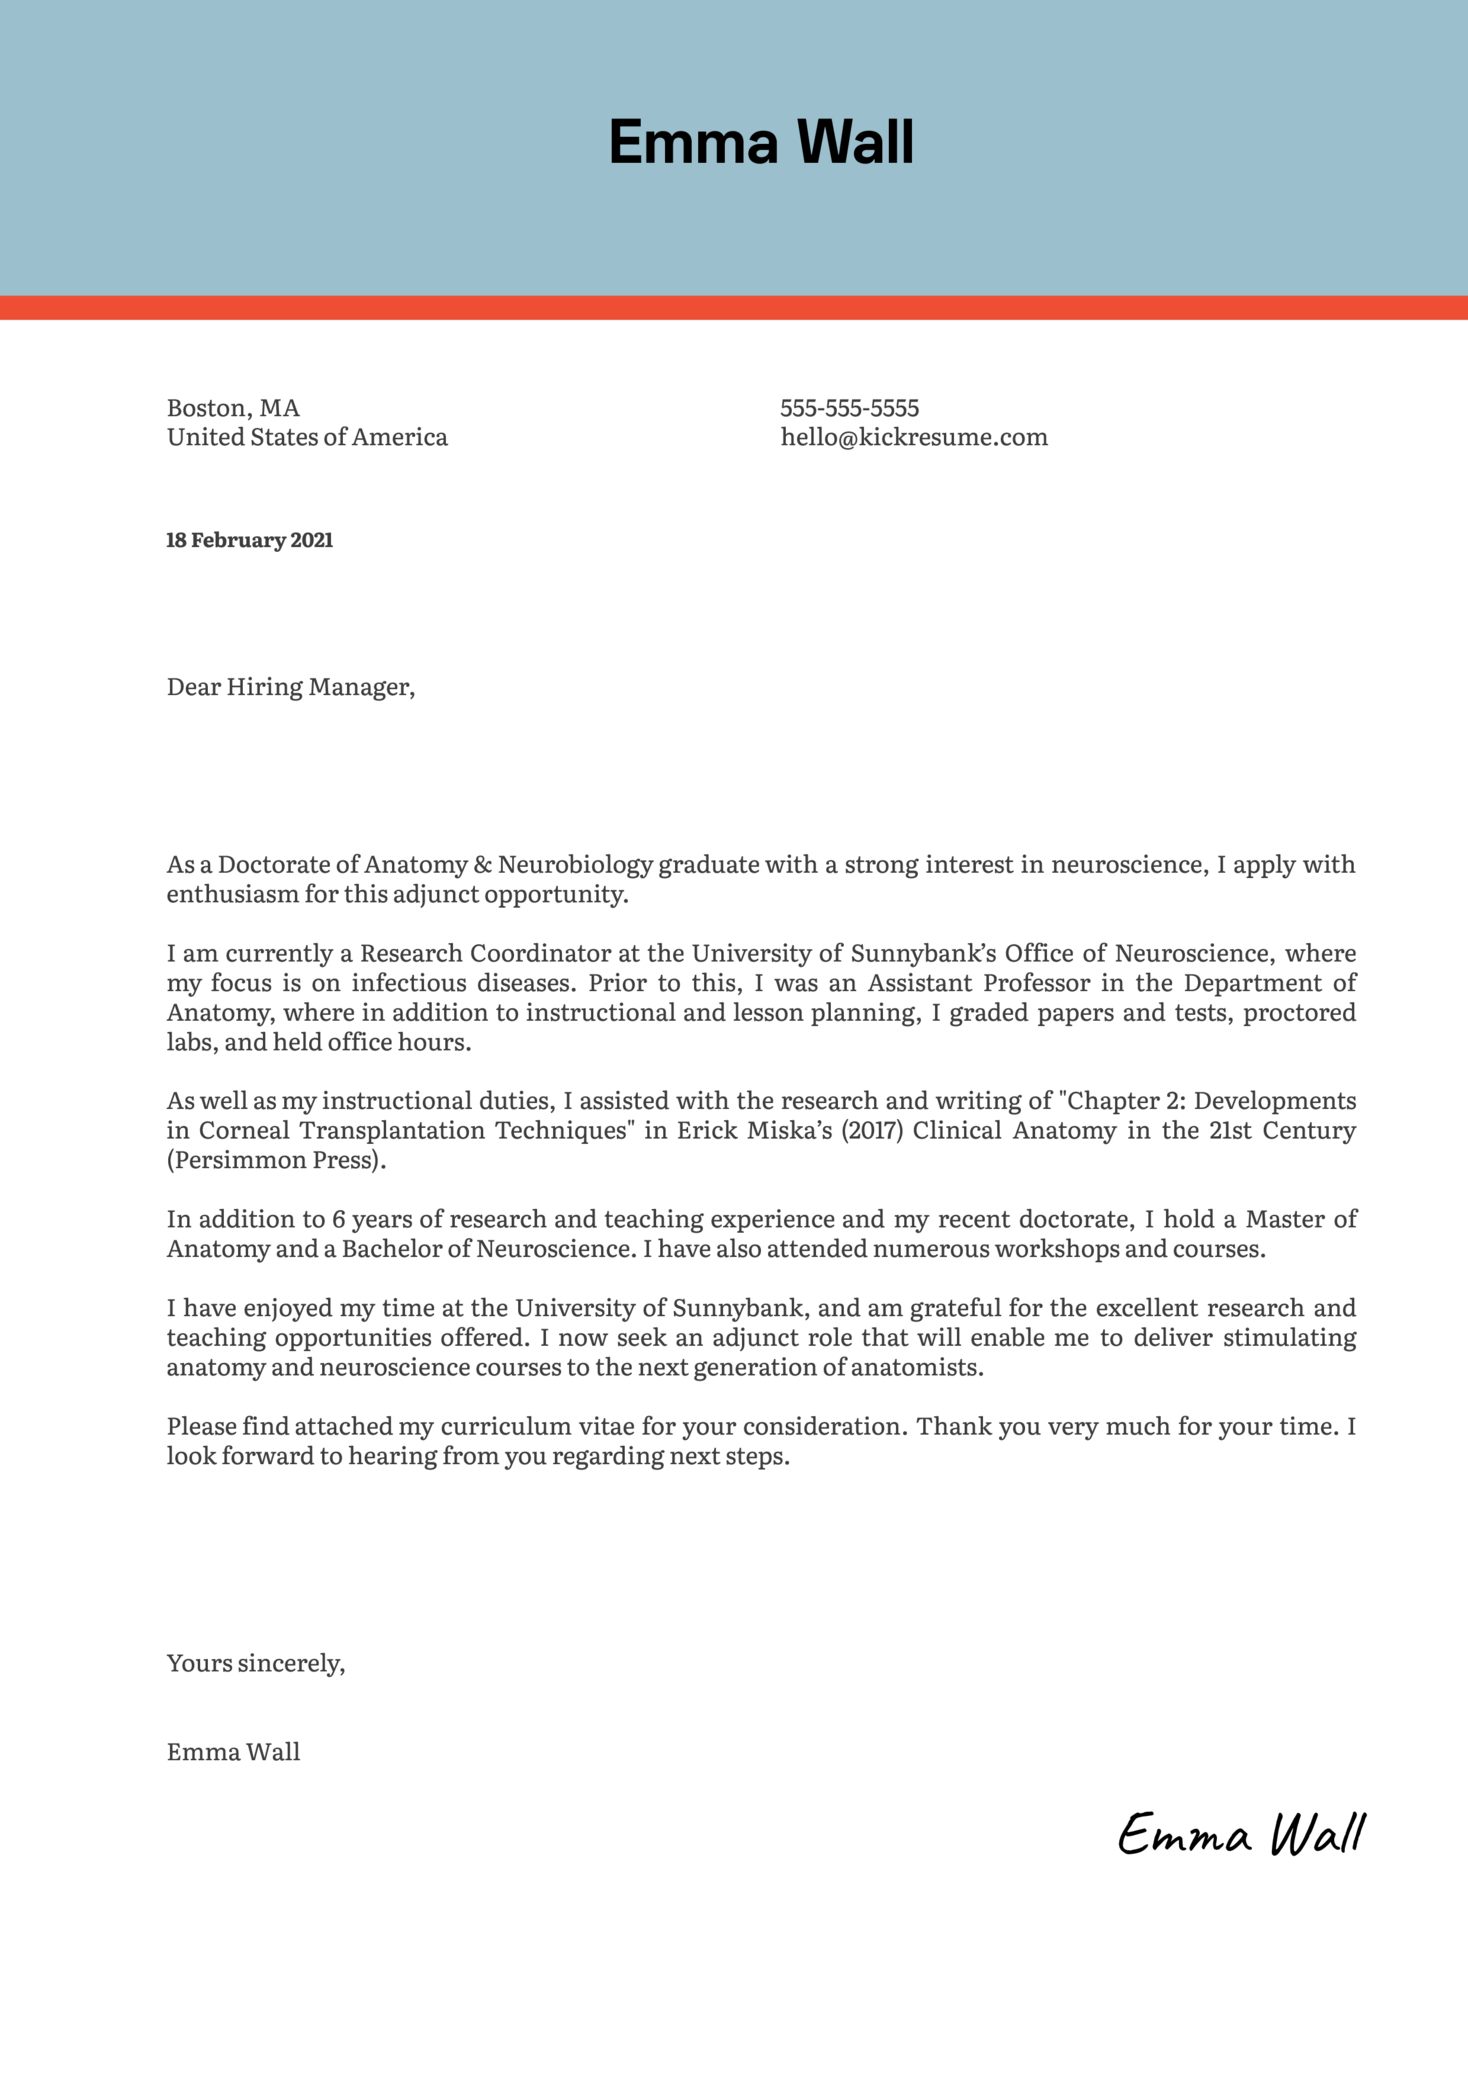 Adjunct Faculty Anatomy Cover Letter Sample